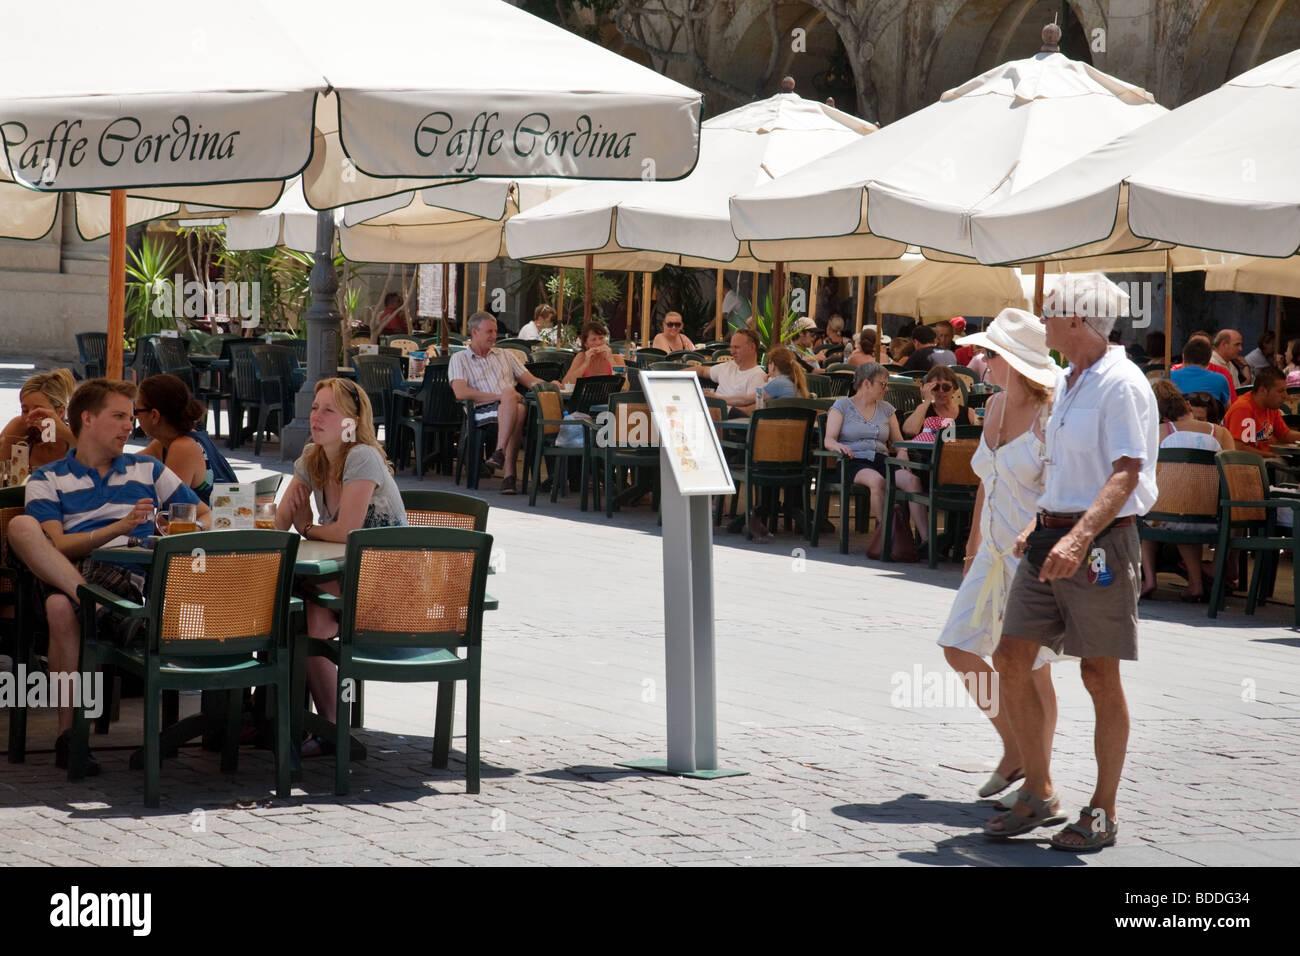 Tourists stop to look at the menu, Caffe Cordina, Republic Square, Valletta, Malta - Stock Image